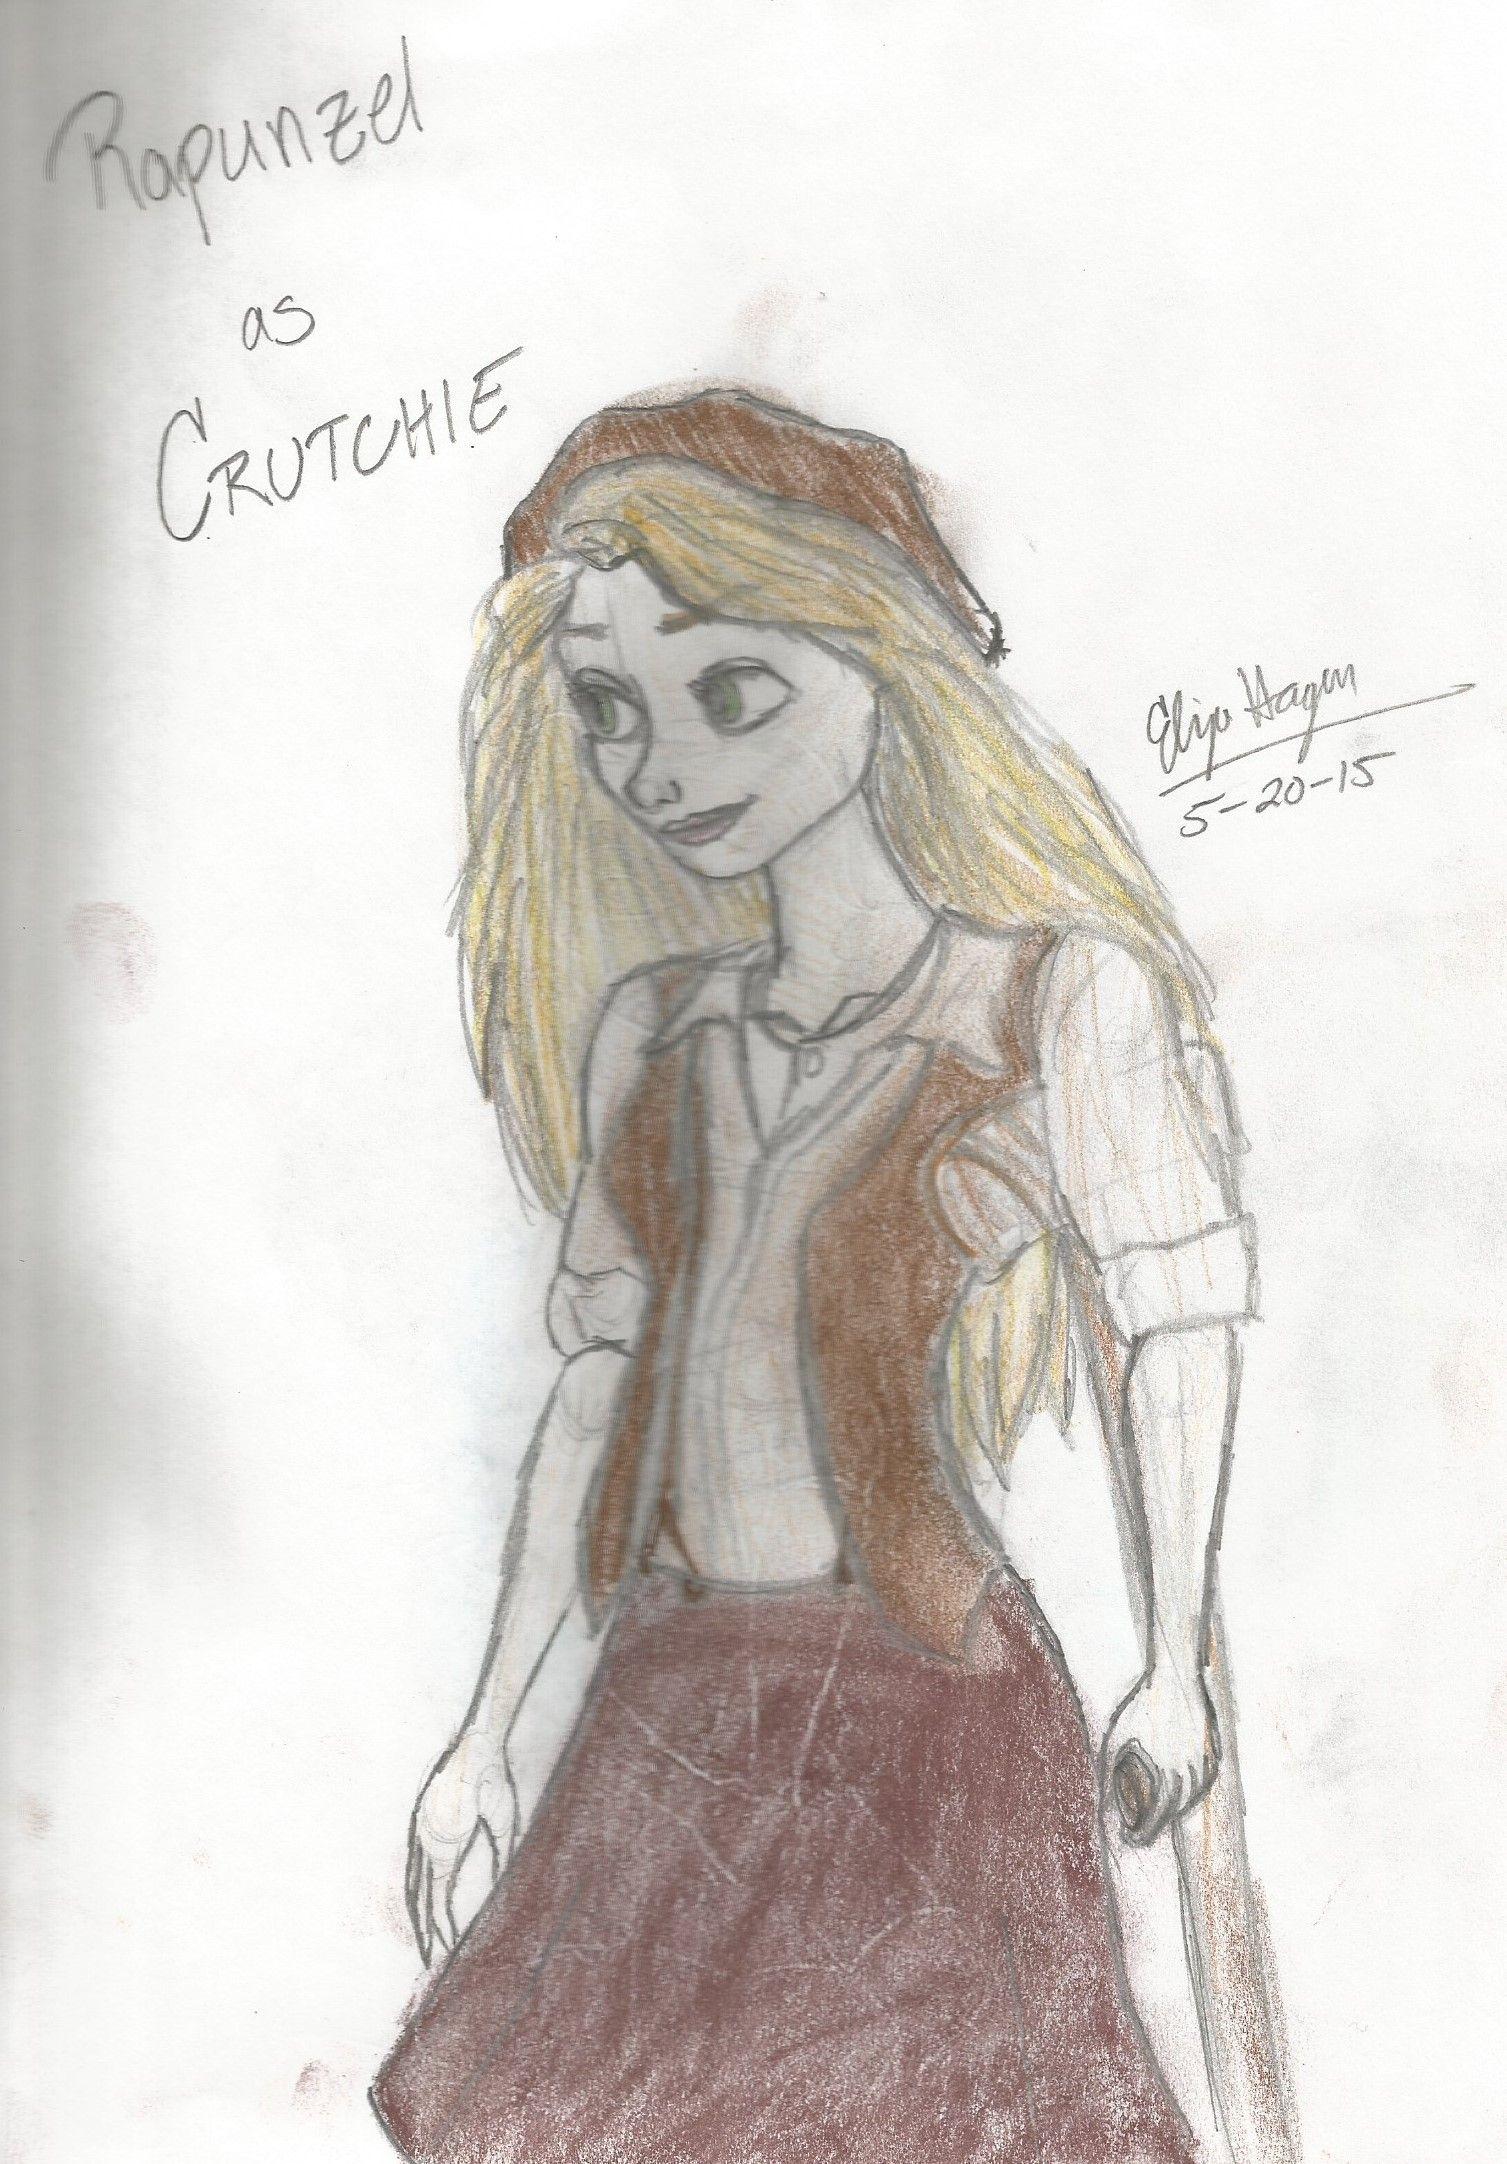 Newsies Crutchie Costume